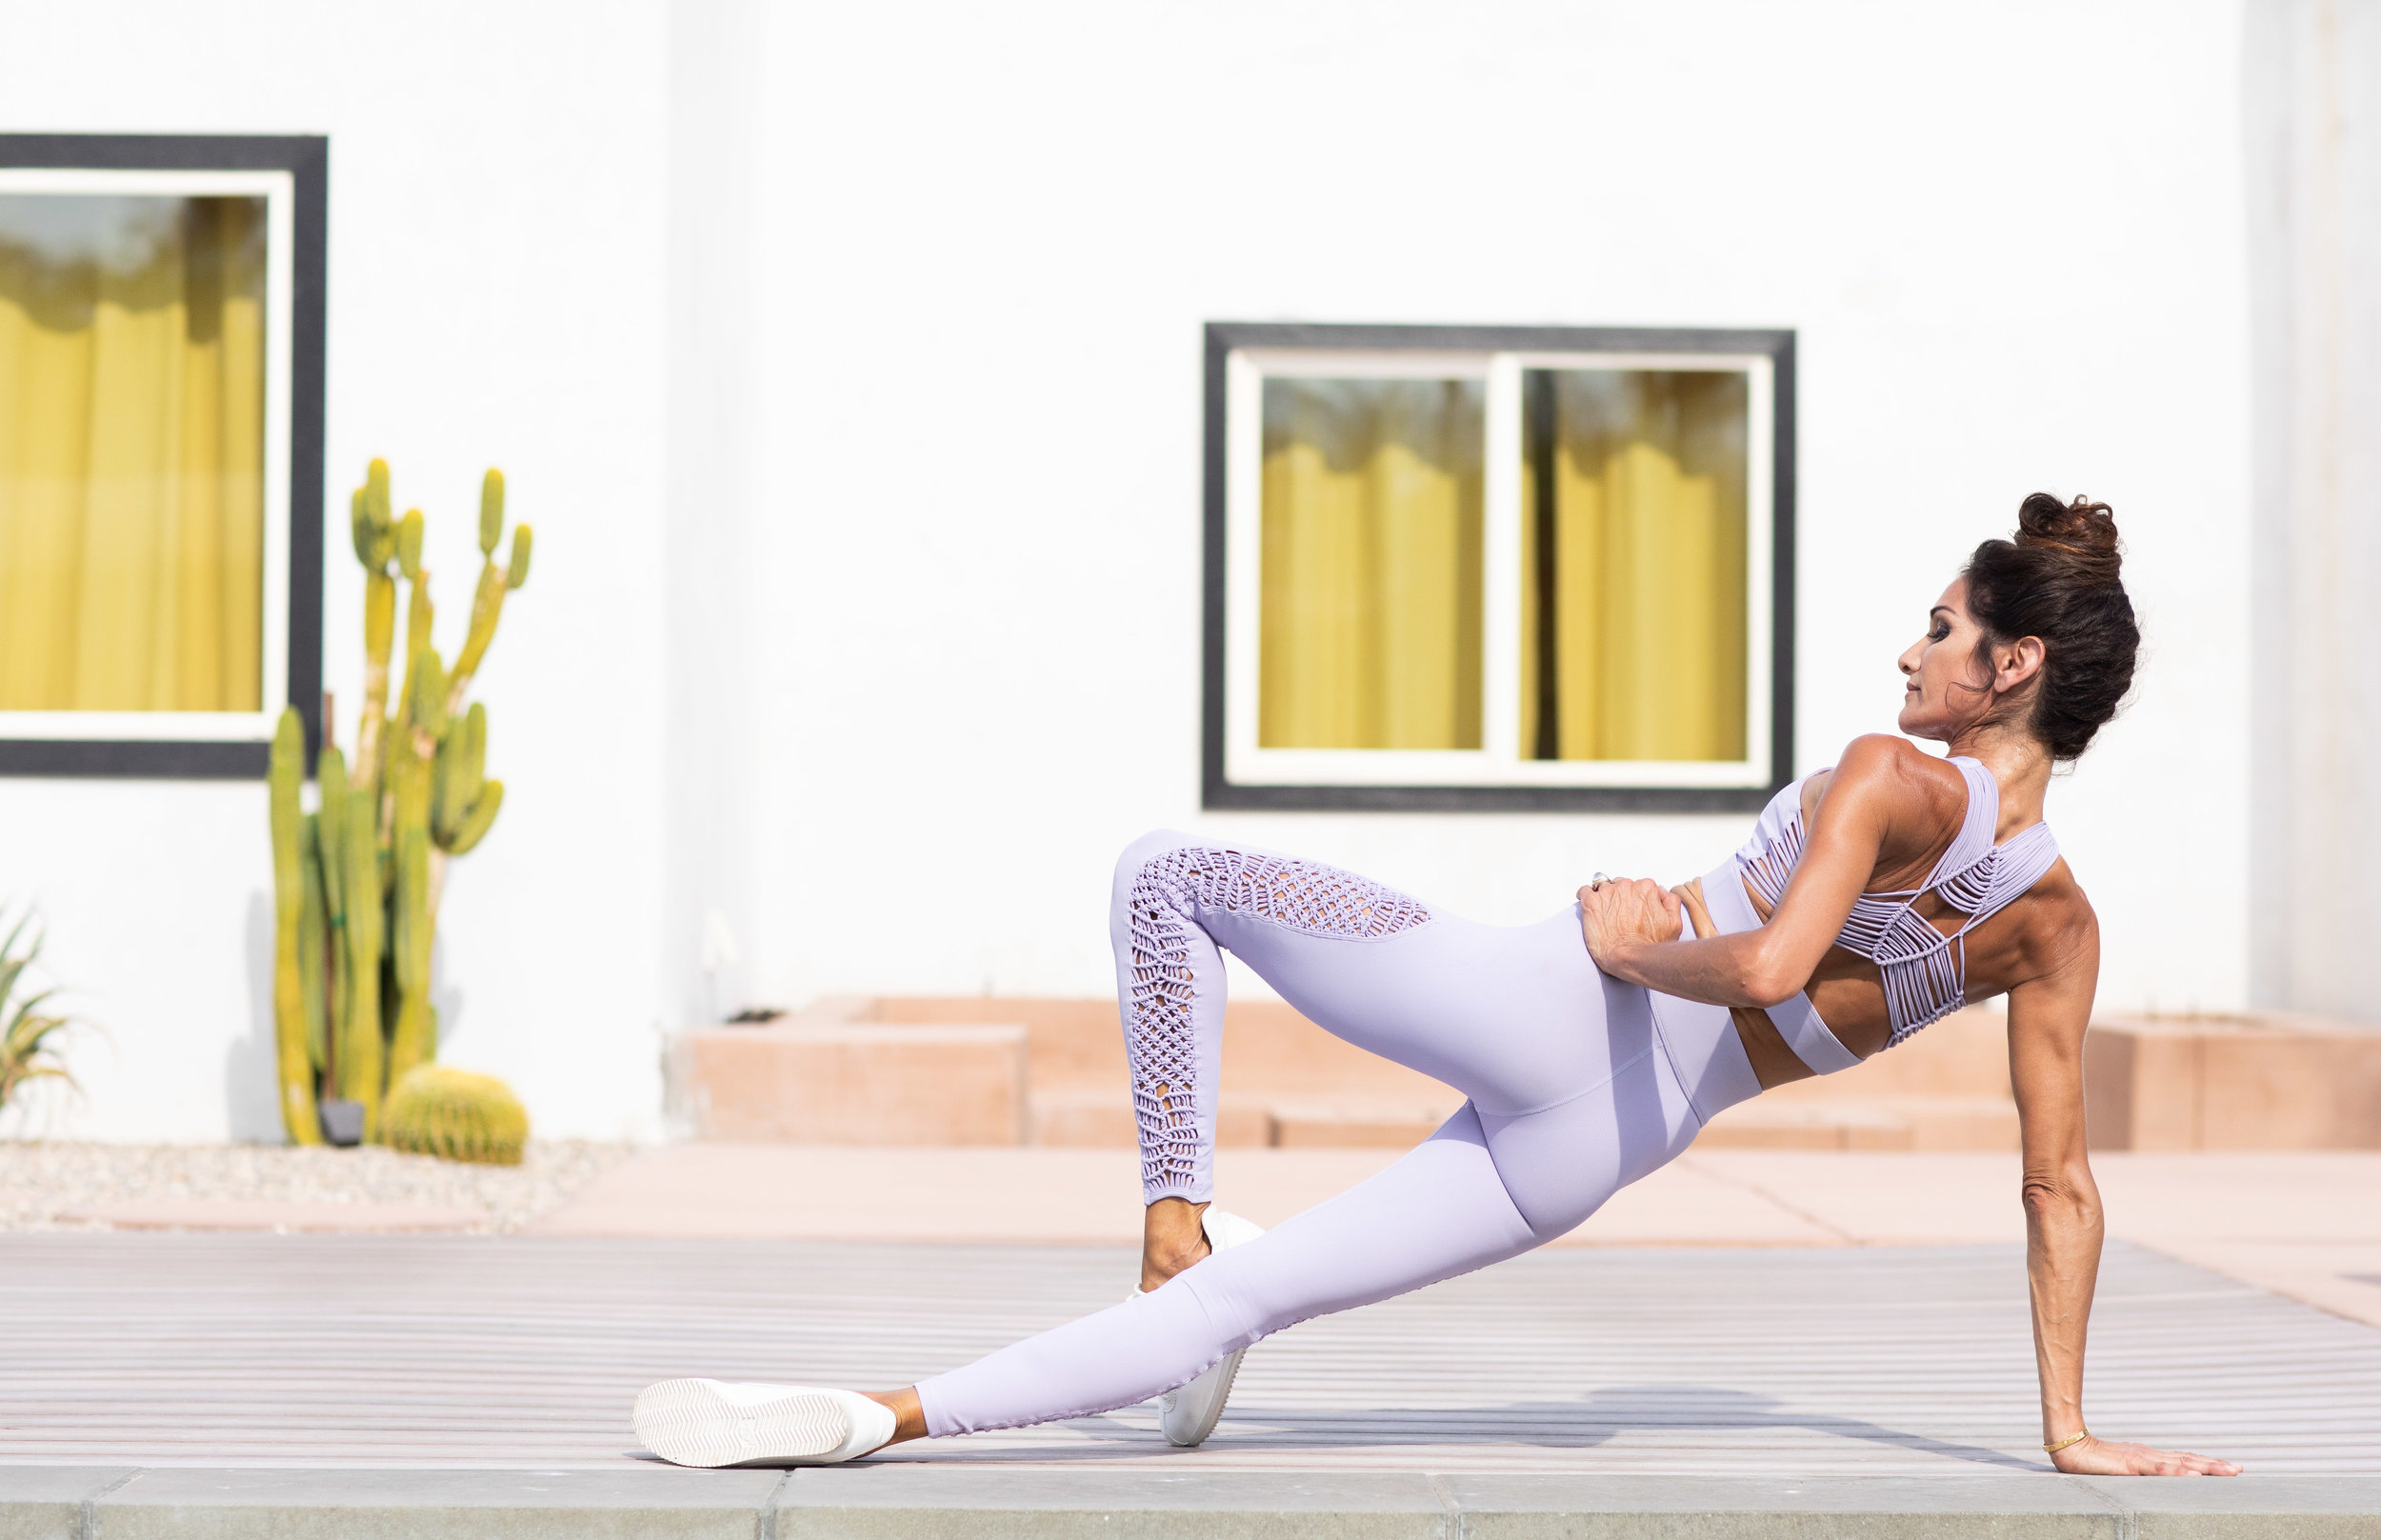 Meet Rhythm Pilates Founder, Lisa Hubbard